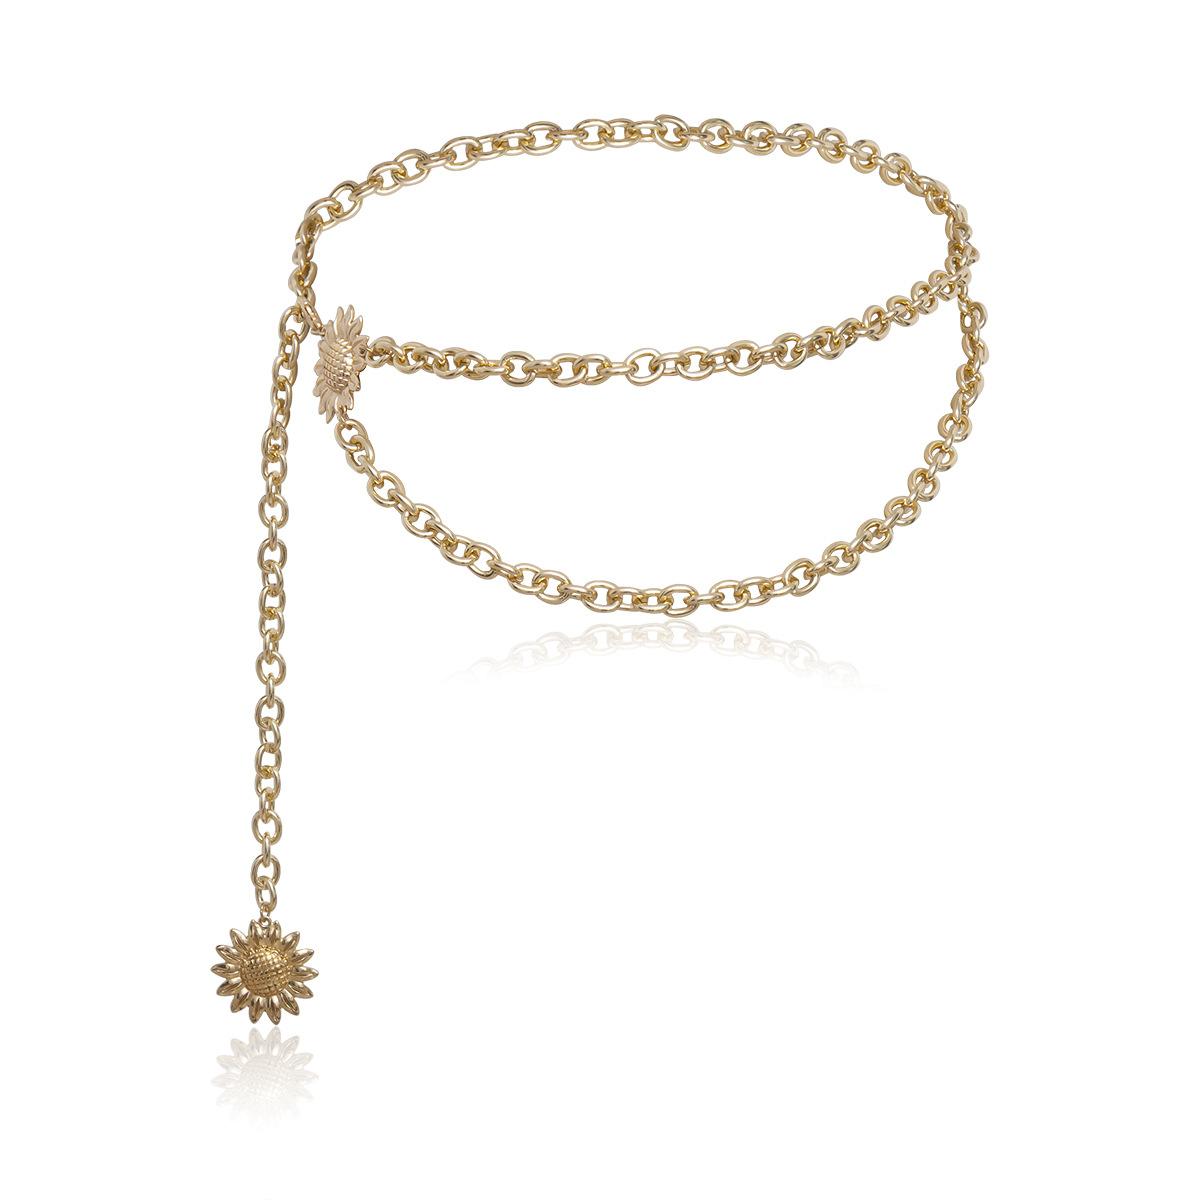 Geometric tassel sun flower U-shaped waist chain NHXR171363